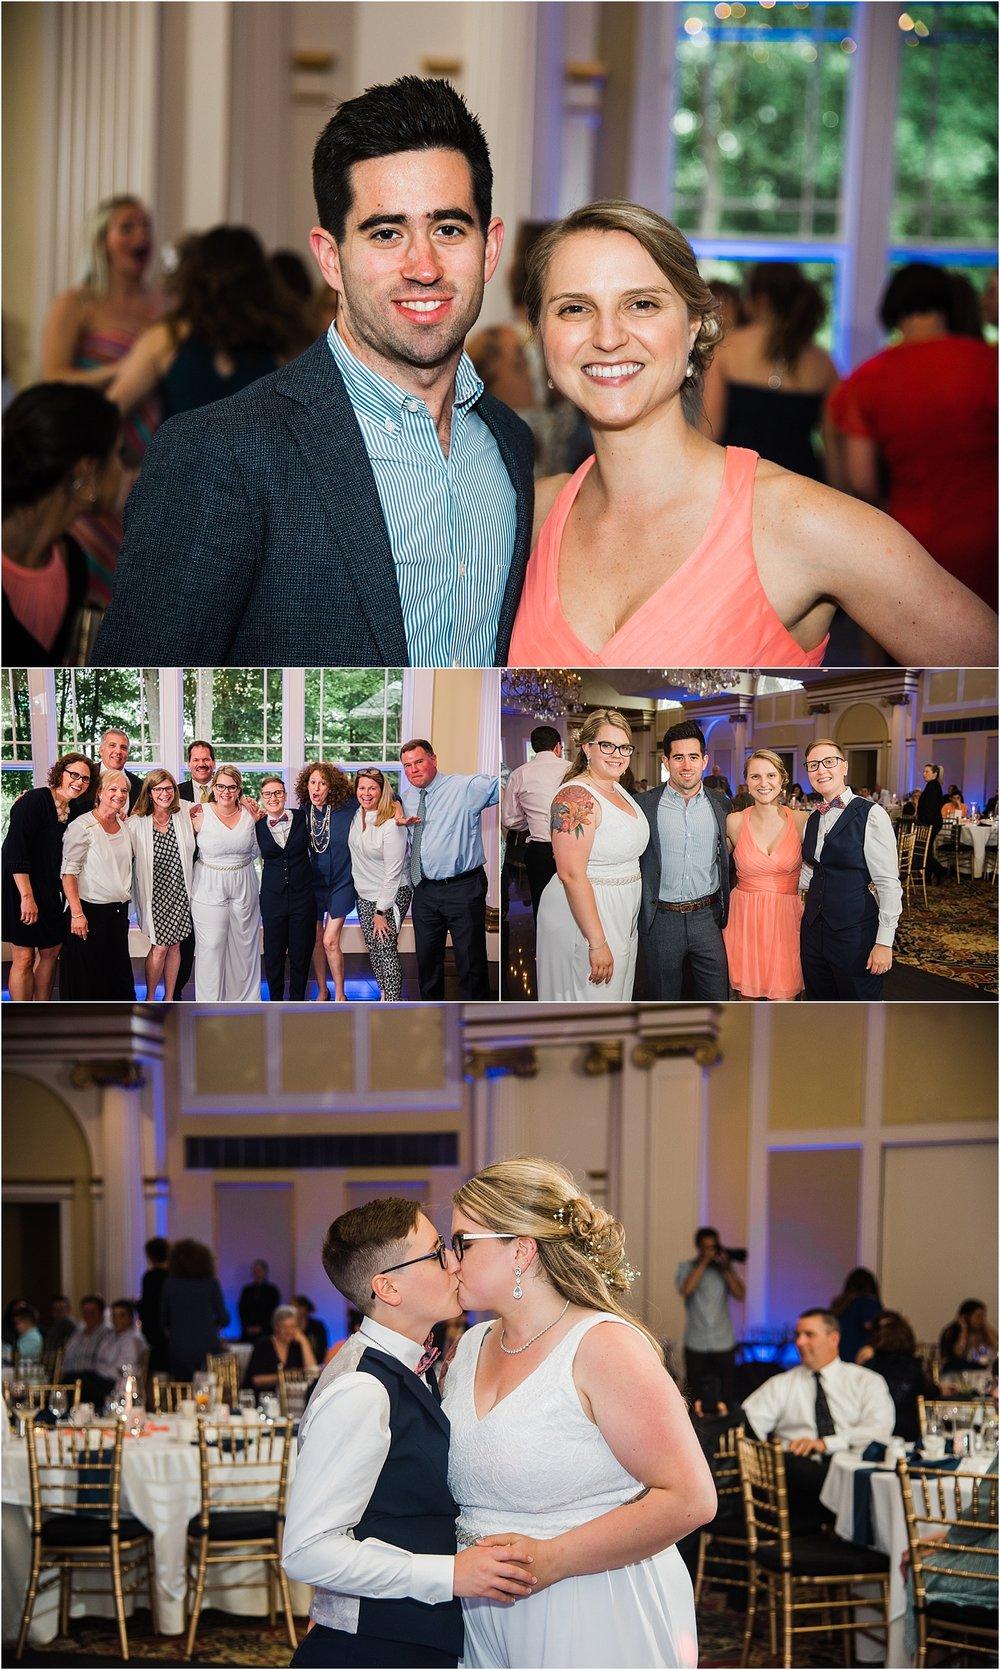 The_Riverview_Simsbury_Connecticut_Wedding_LGBT_Weddings_084.jpg